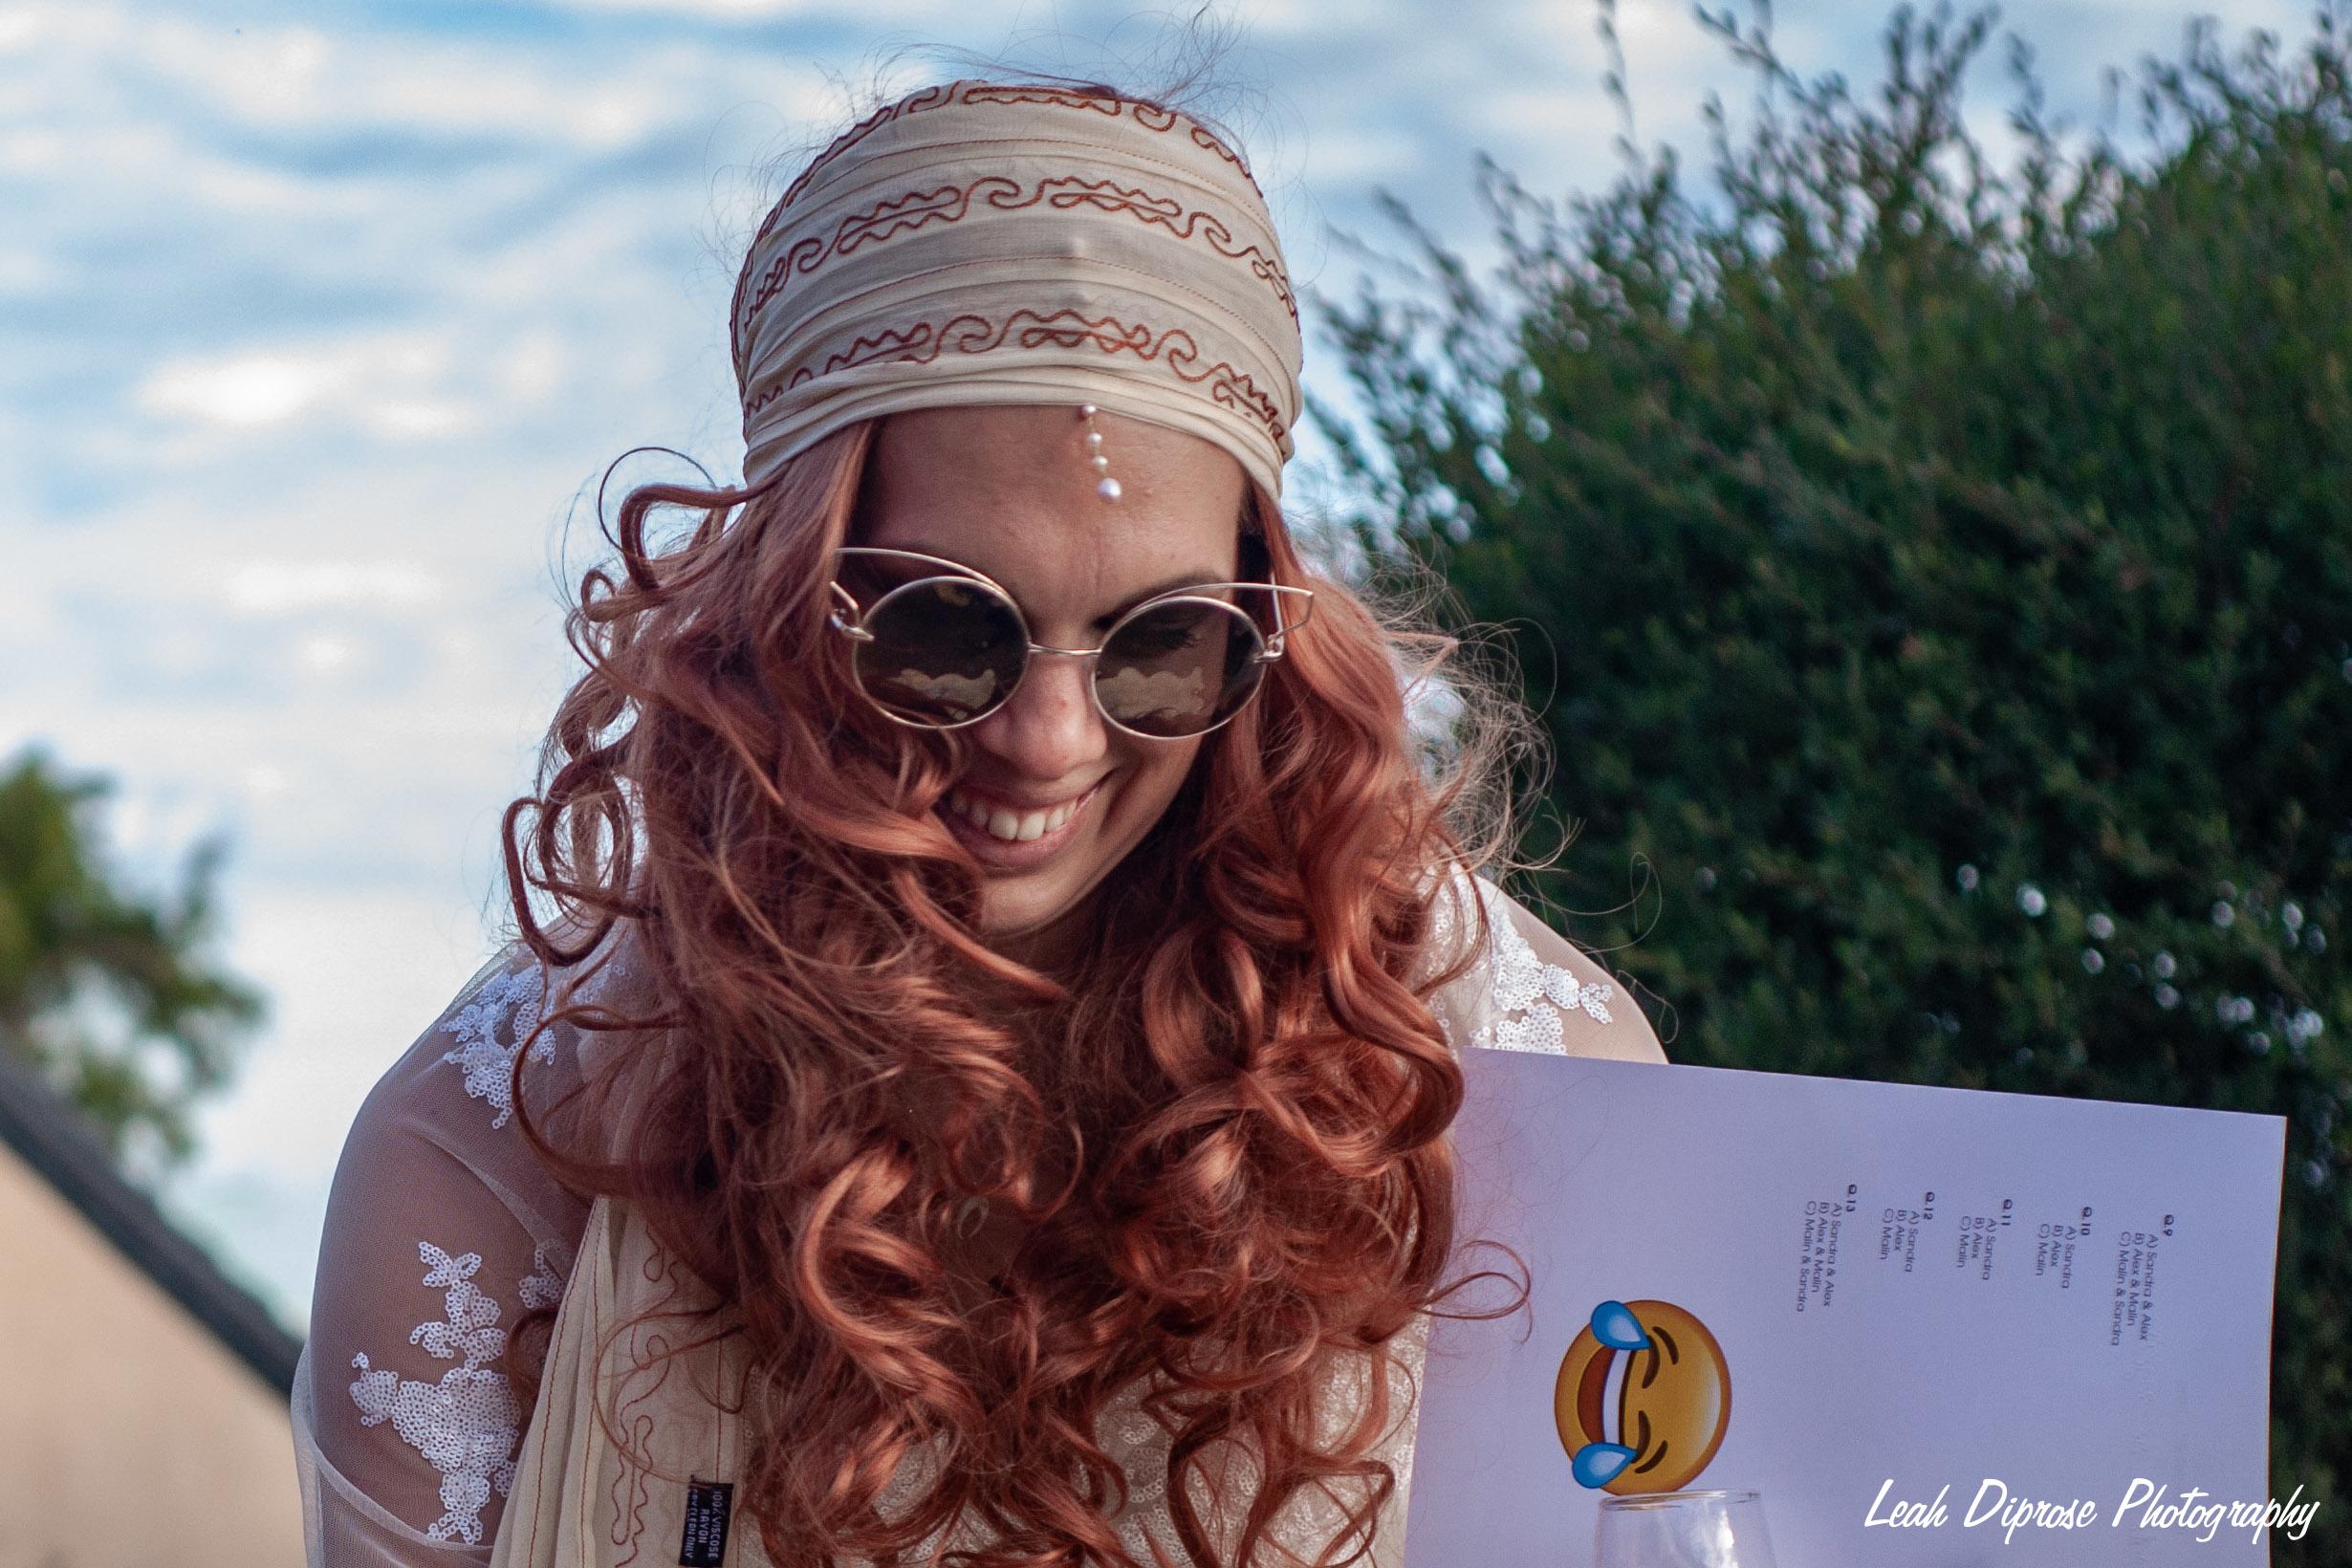 Leah Diprose Photography image-9770.jpg